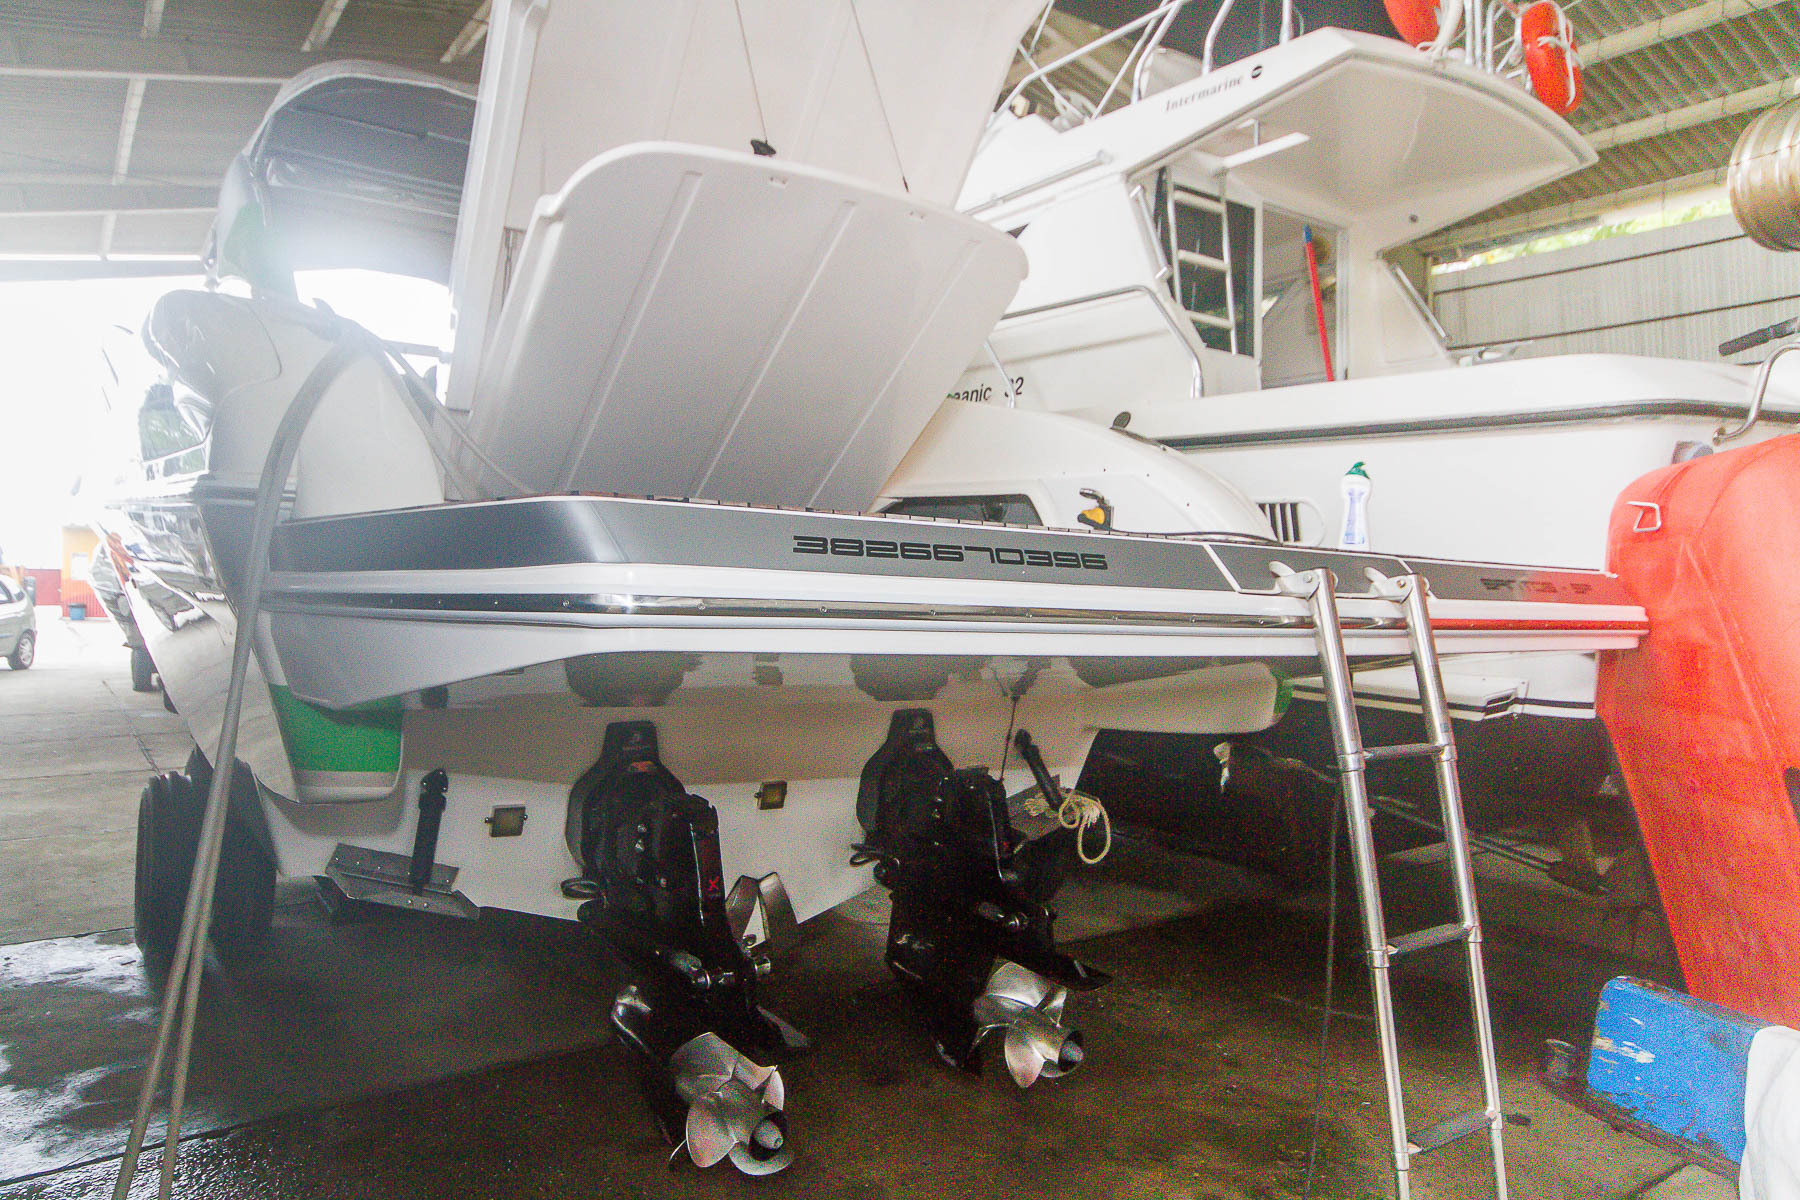 Axtor Marine 48